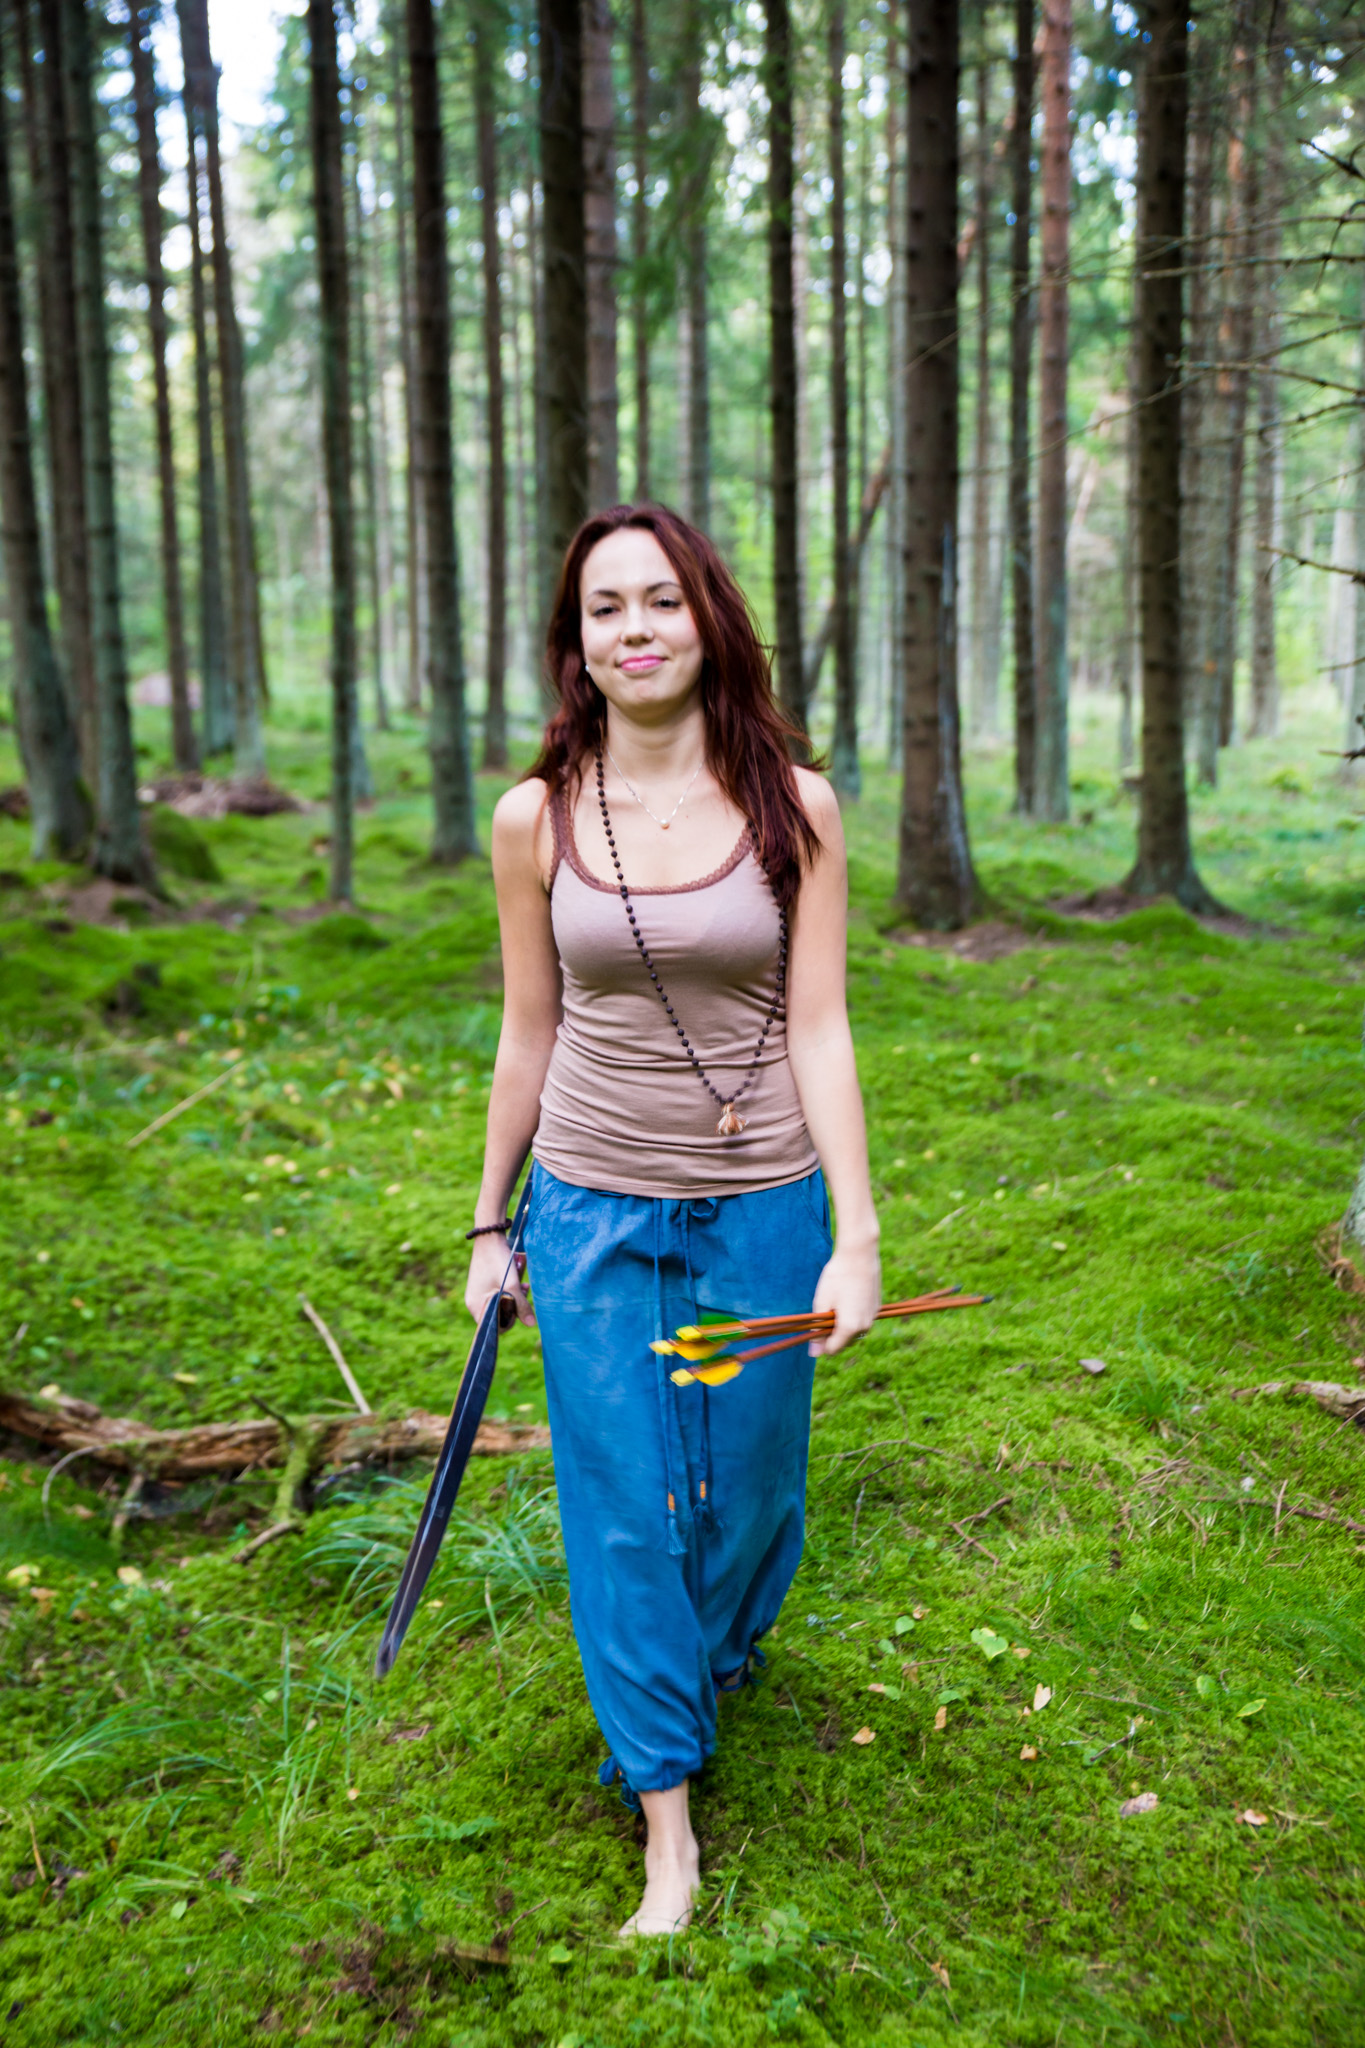 Top: Beige Organic Hot Yoga top – 29.00 €  Skirt: Indigo Fera skirt – 89.00 €  Jewelry: Healing Lava Mala – 99.00 €